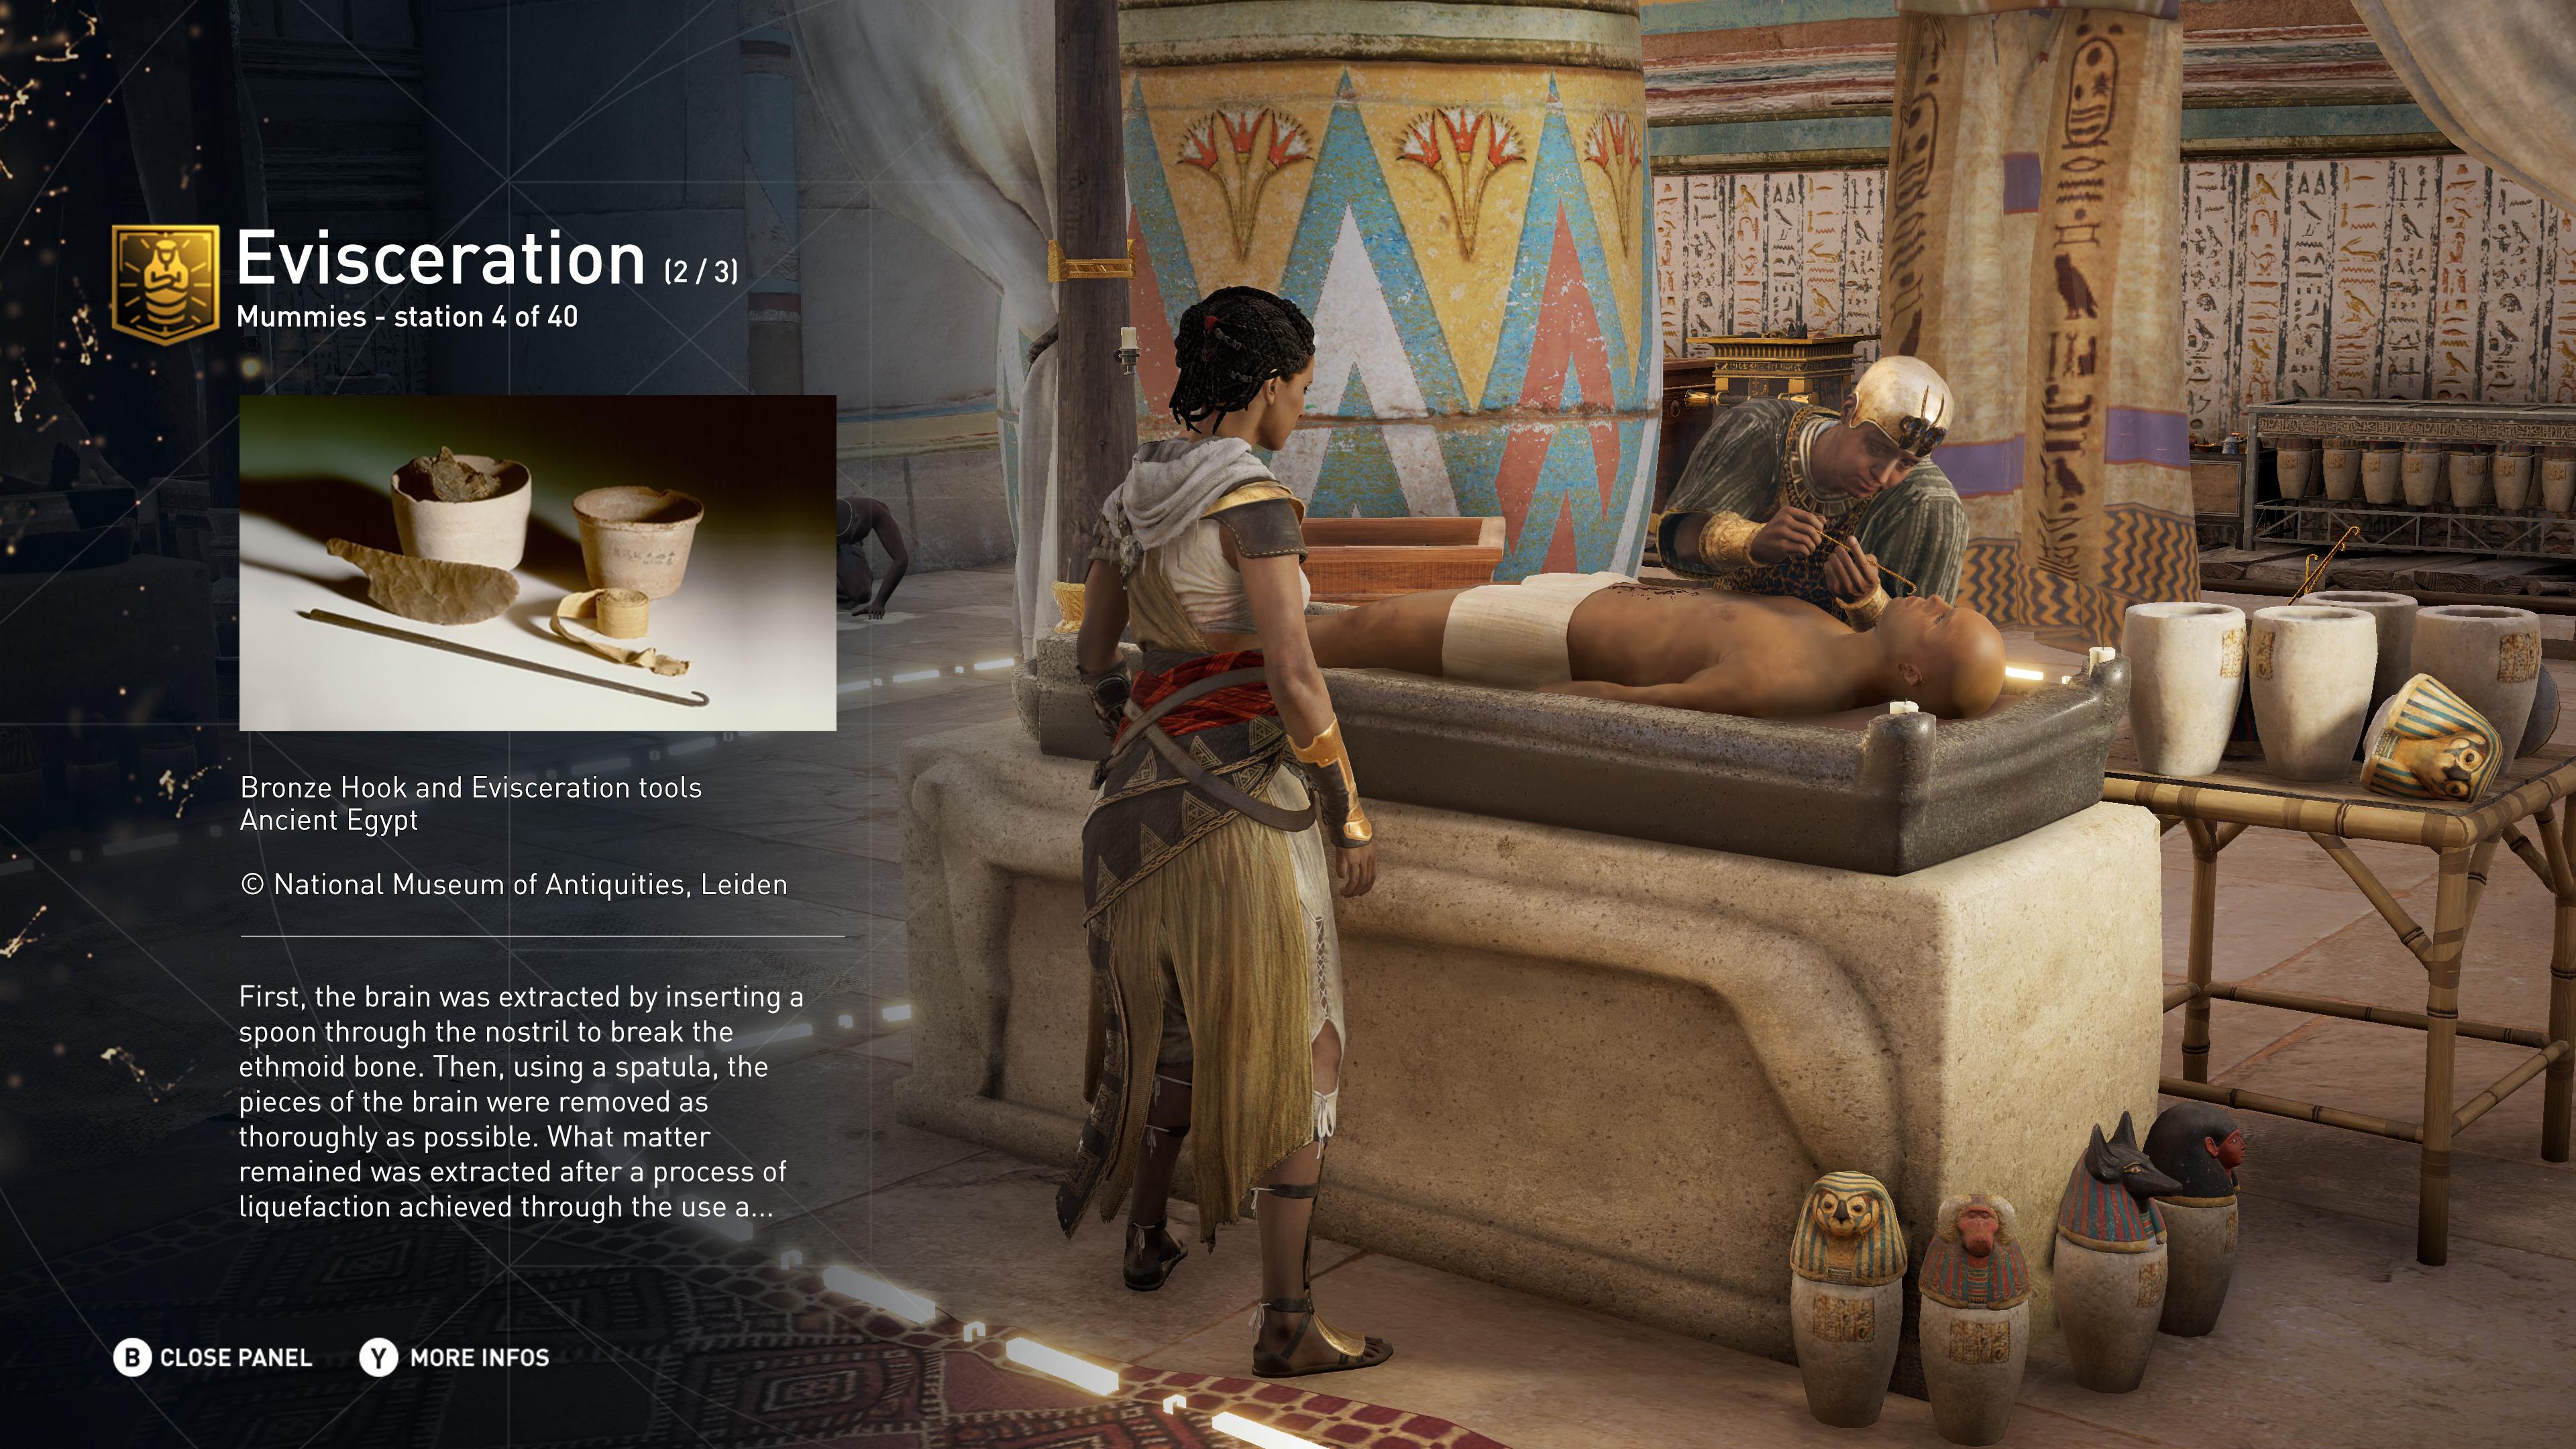 ACO_DiscoveryTour_Evisceration_PR_170927_5_1506340046.30pm_UK_time